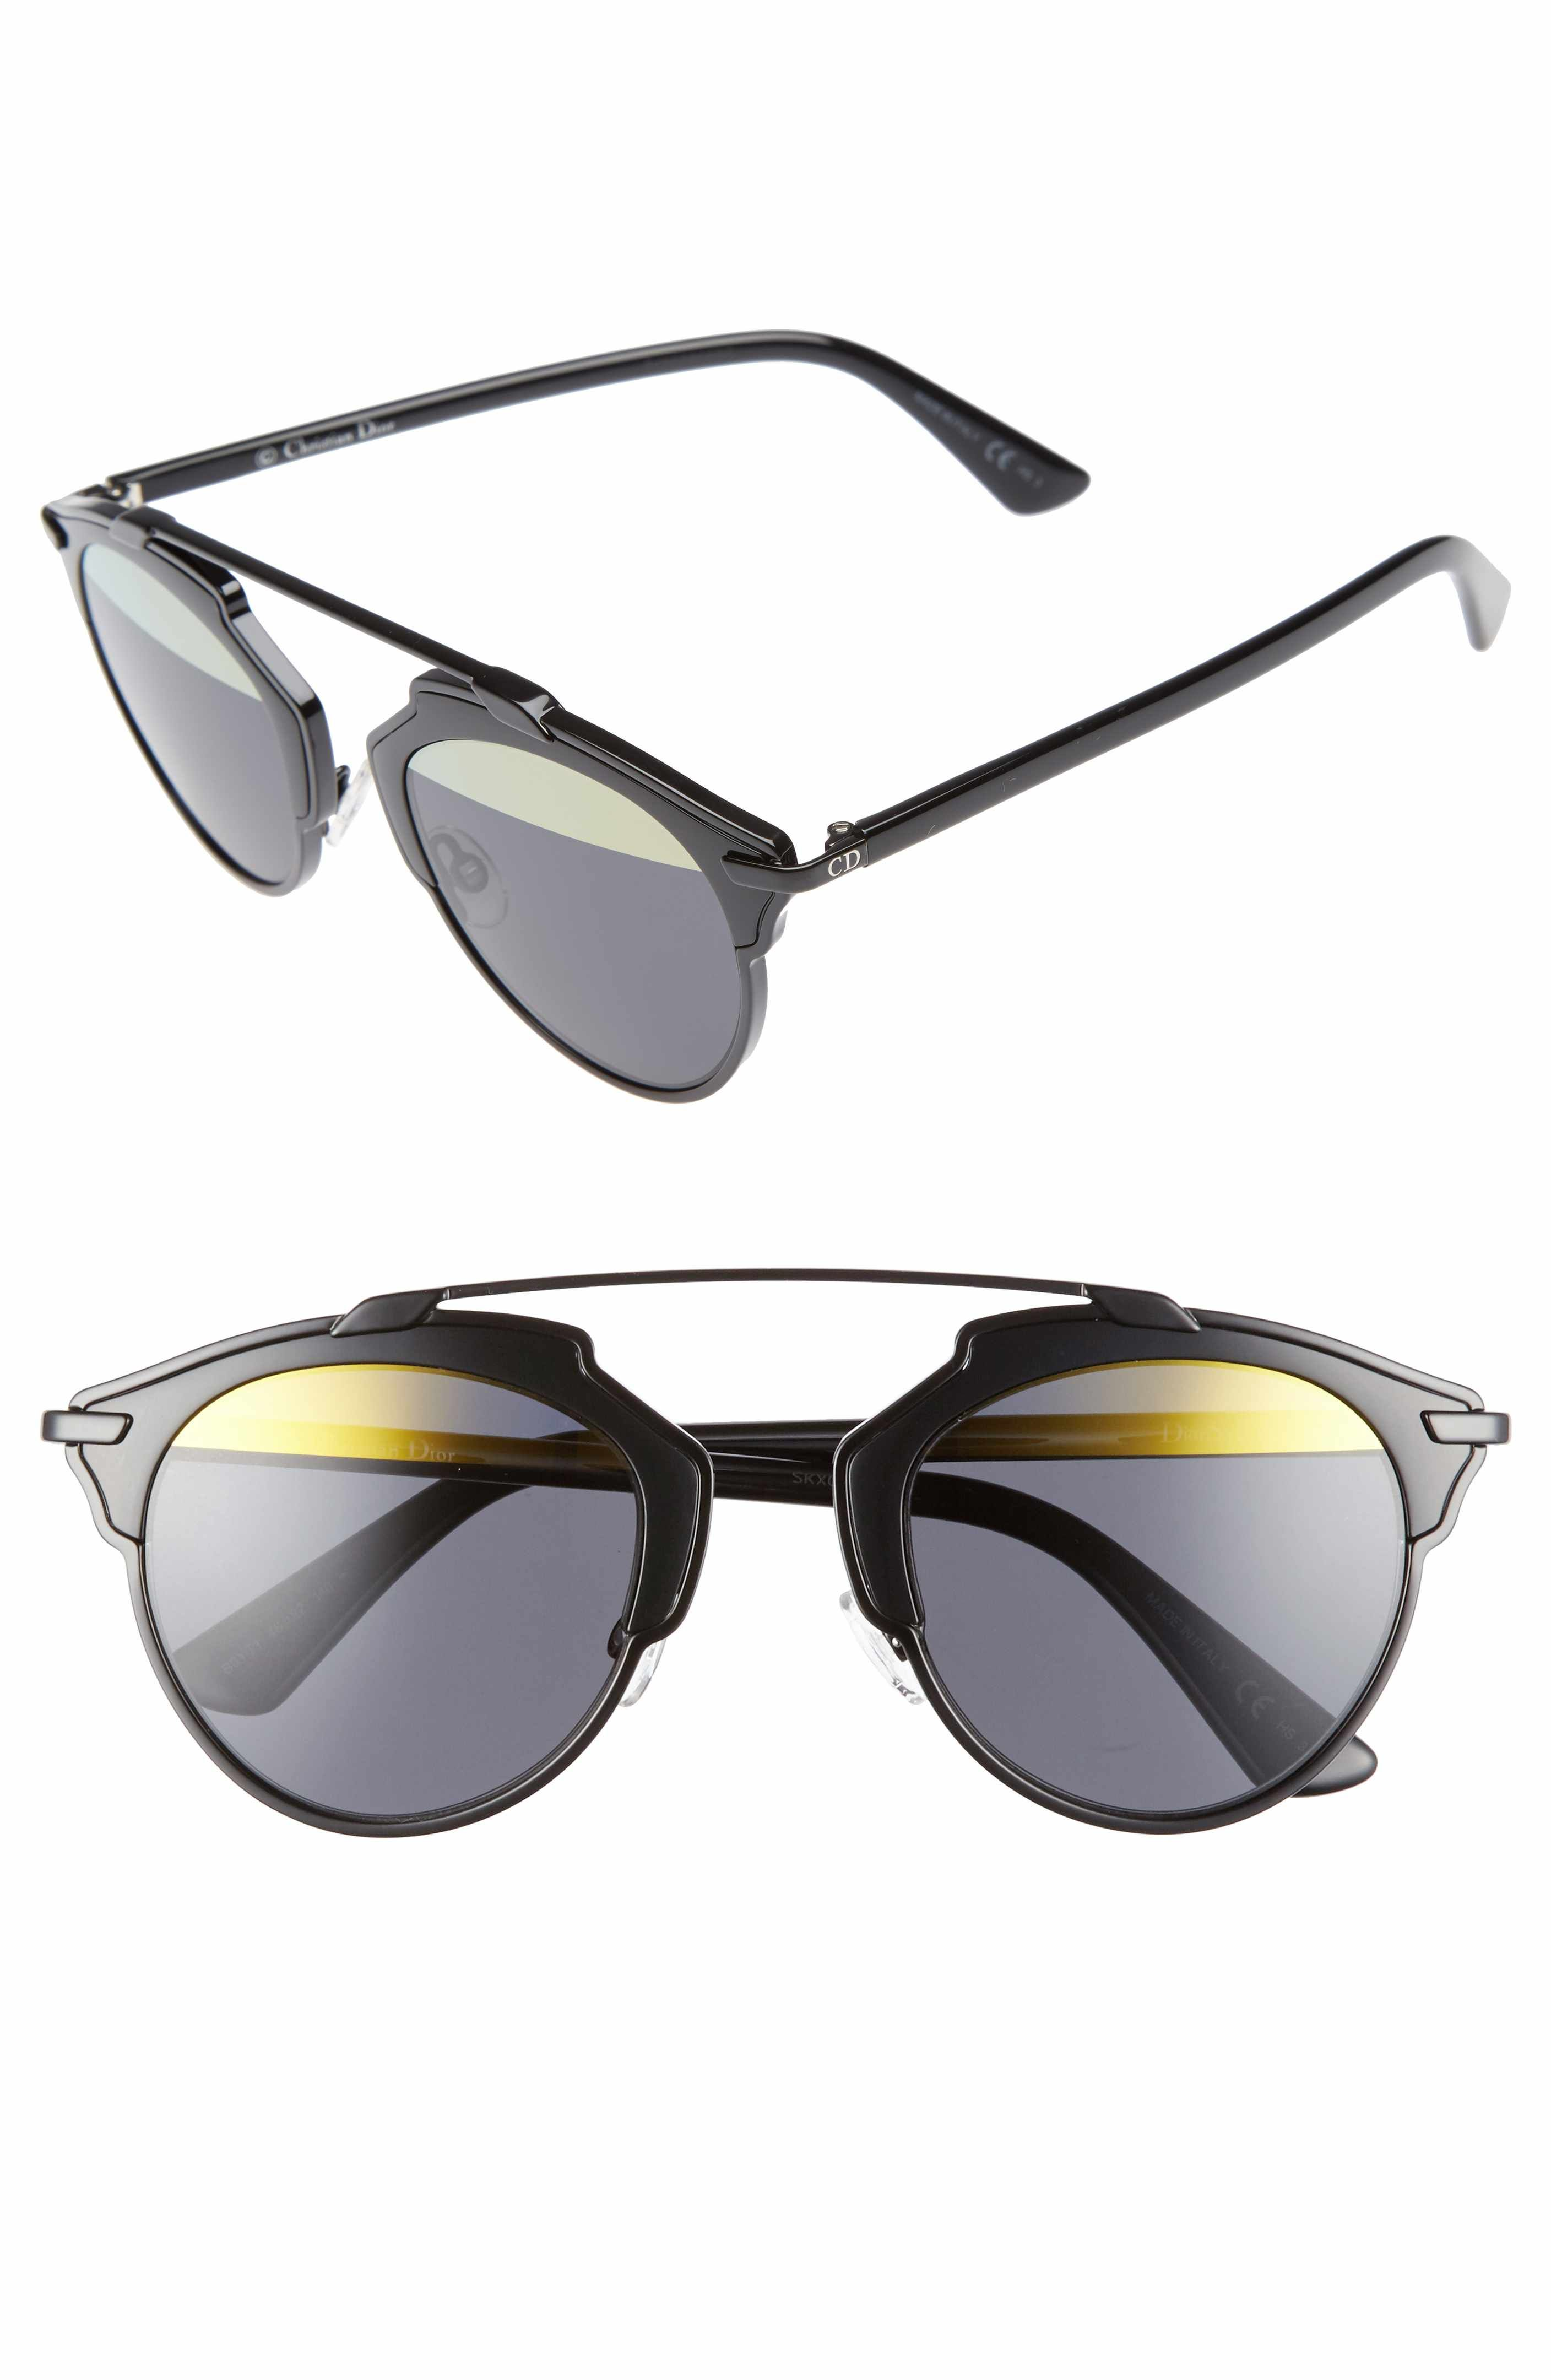 552dd05a67 Celine for Men Sunglasses CL41026 S